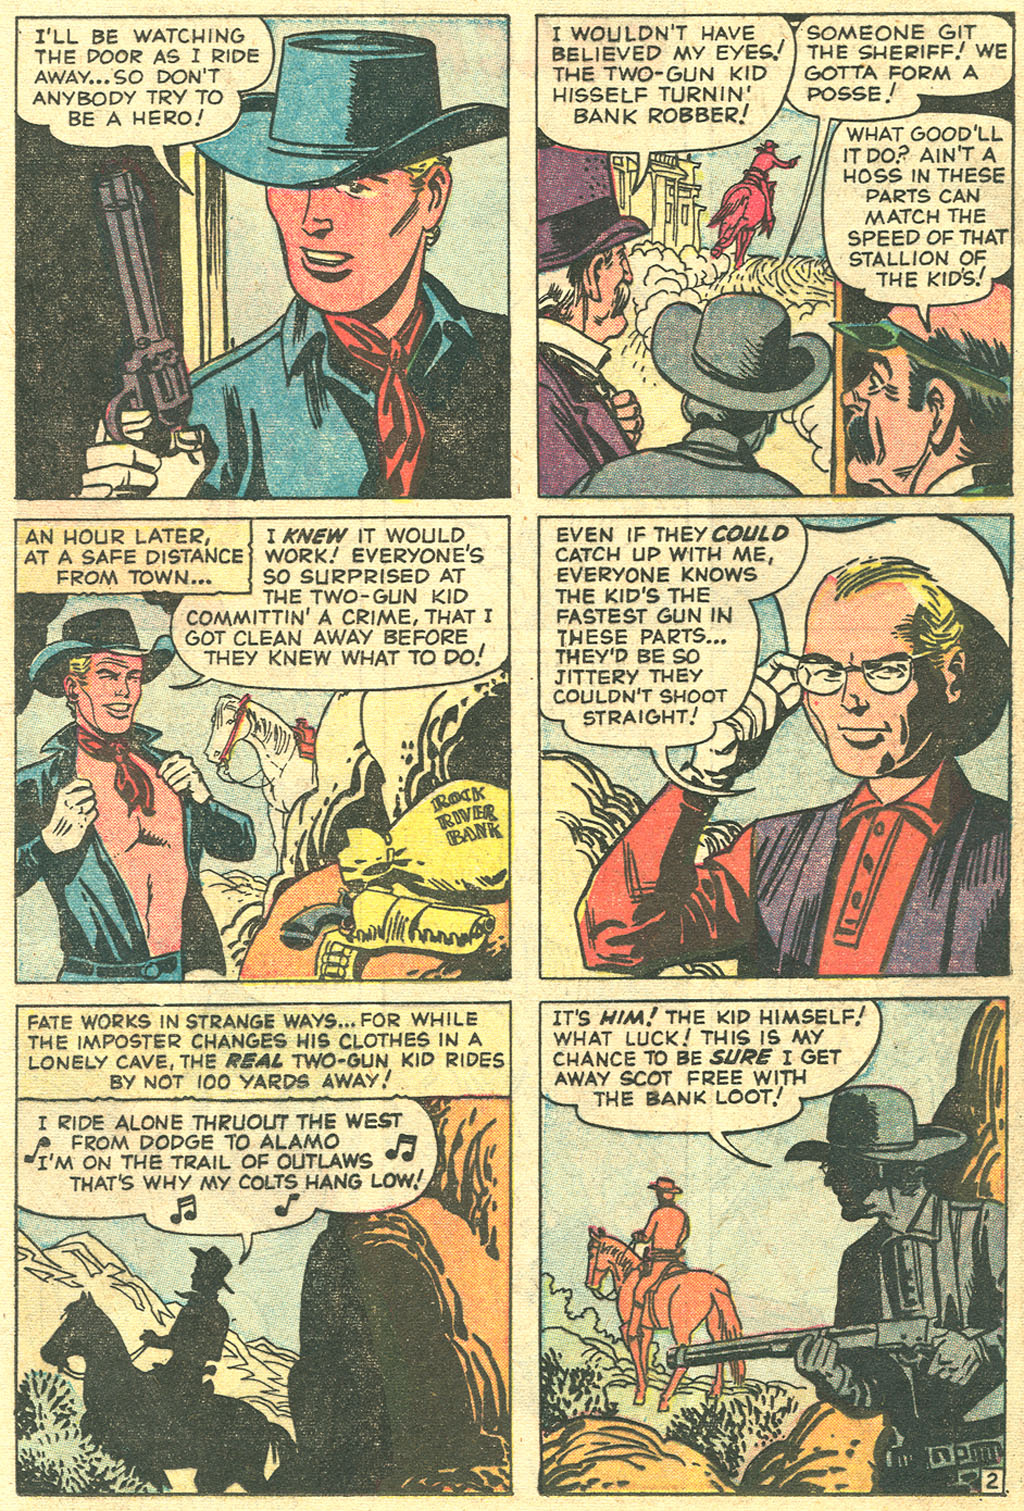 Read online Two-Gun Kid comic -  Issue #44 - 13